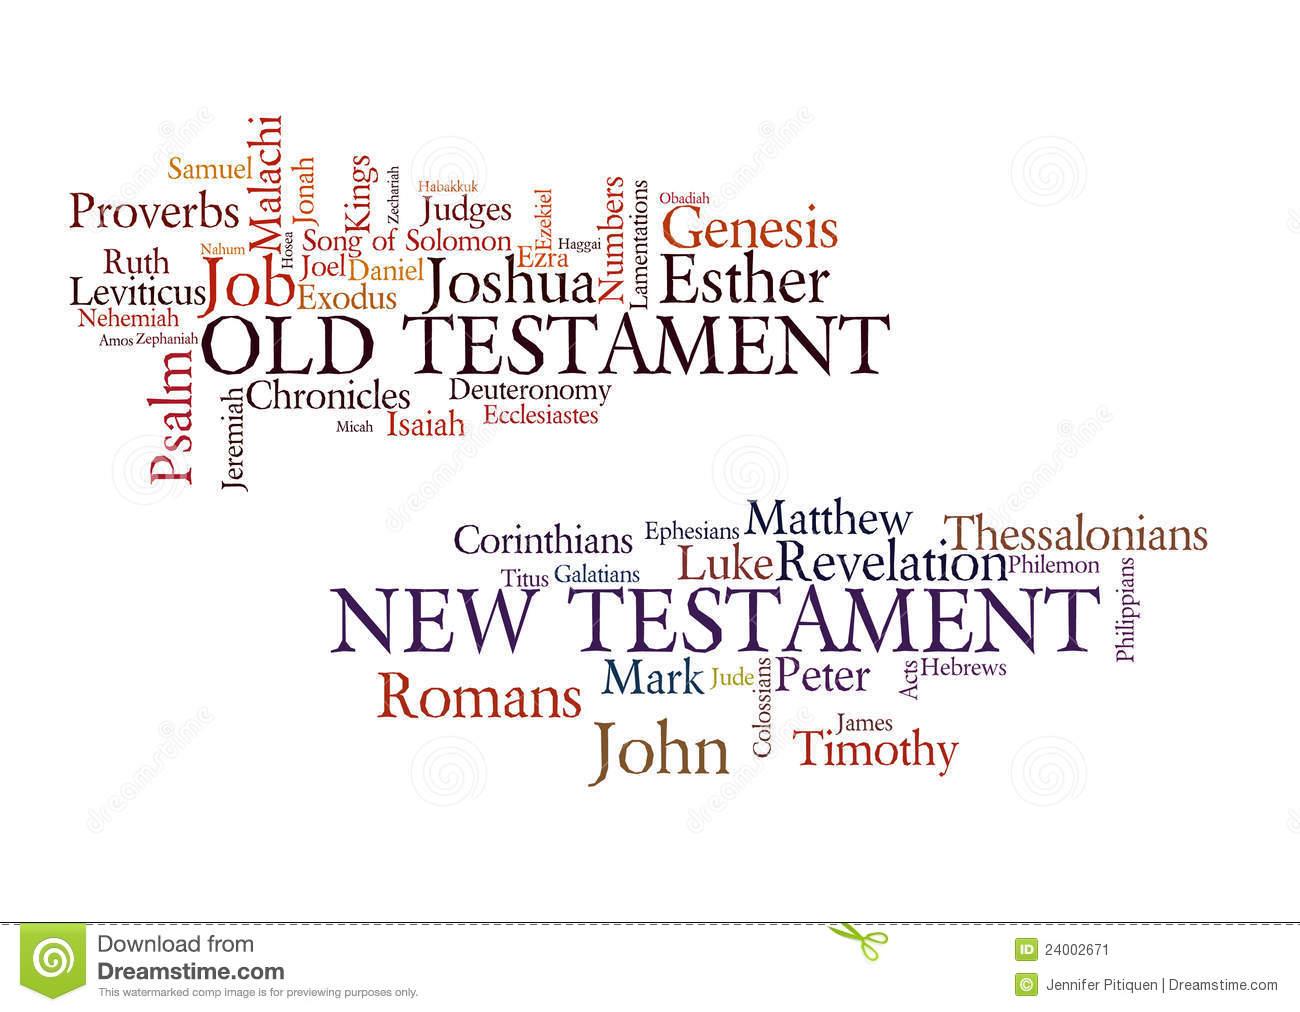 Bible clipart new testament. Understanding the books in